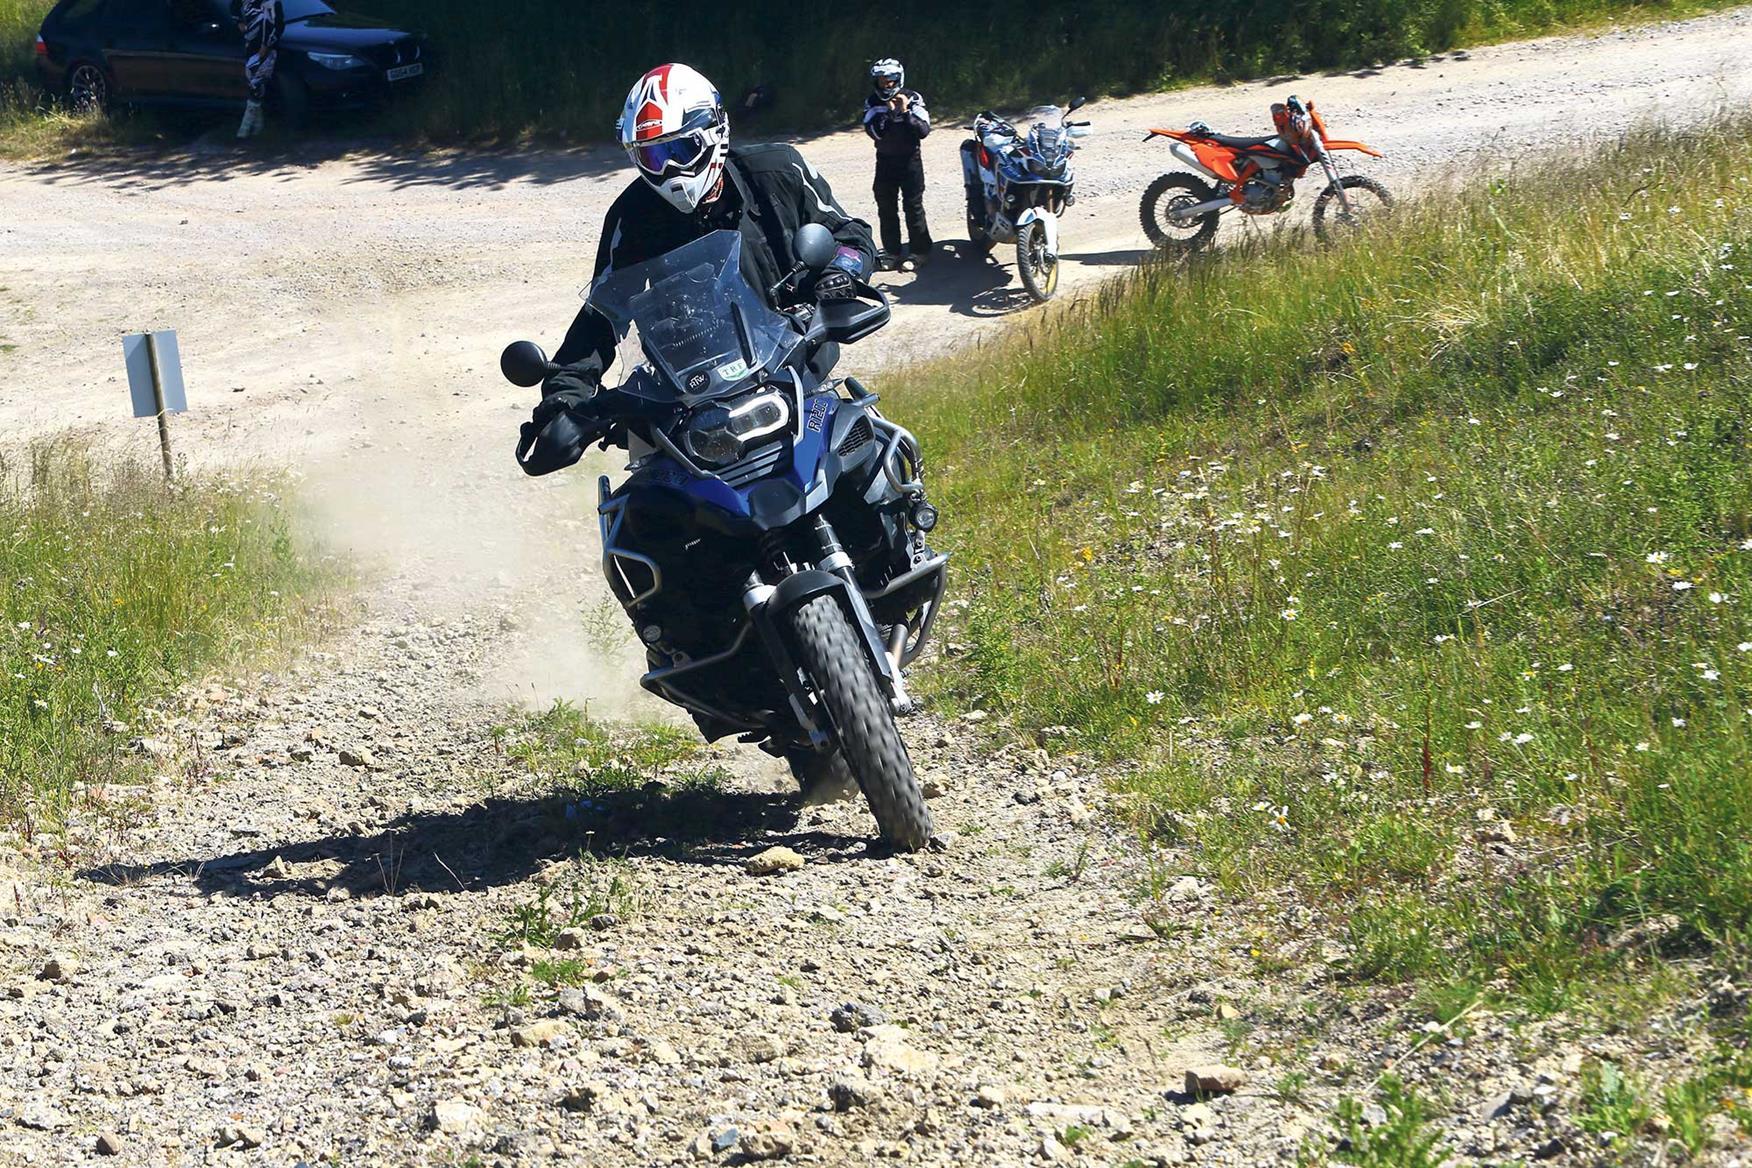 Climbing is an essential off road motorbiking skill